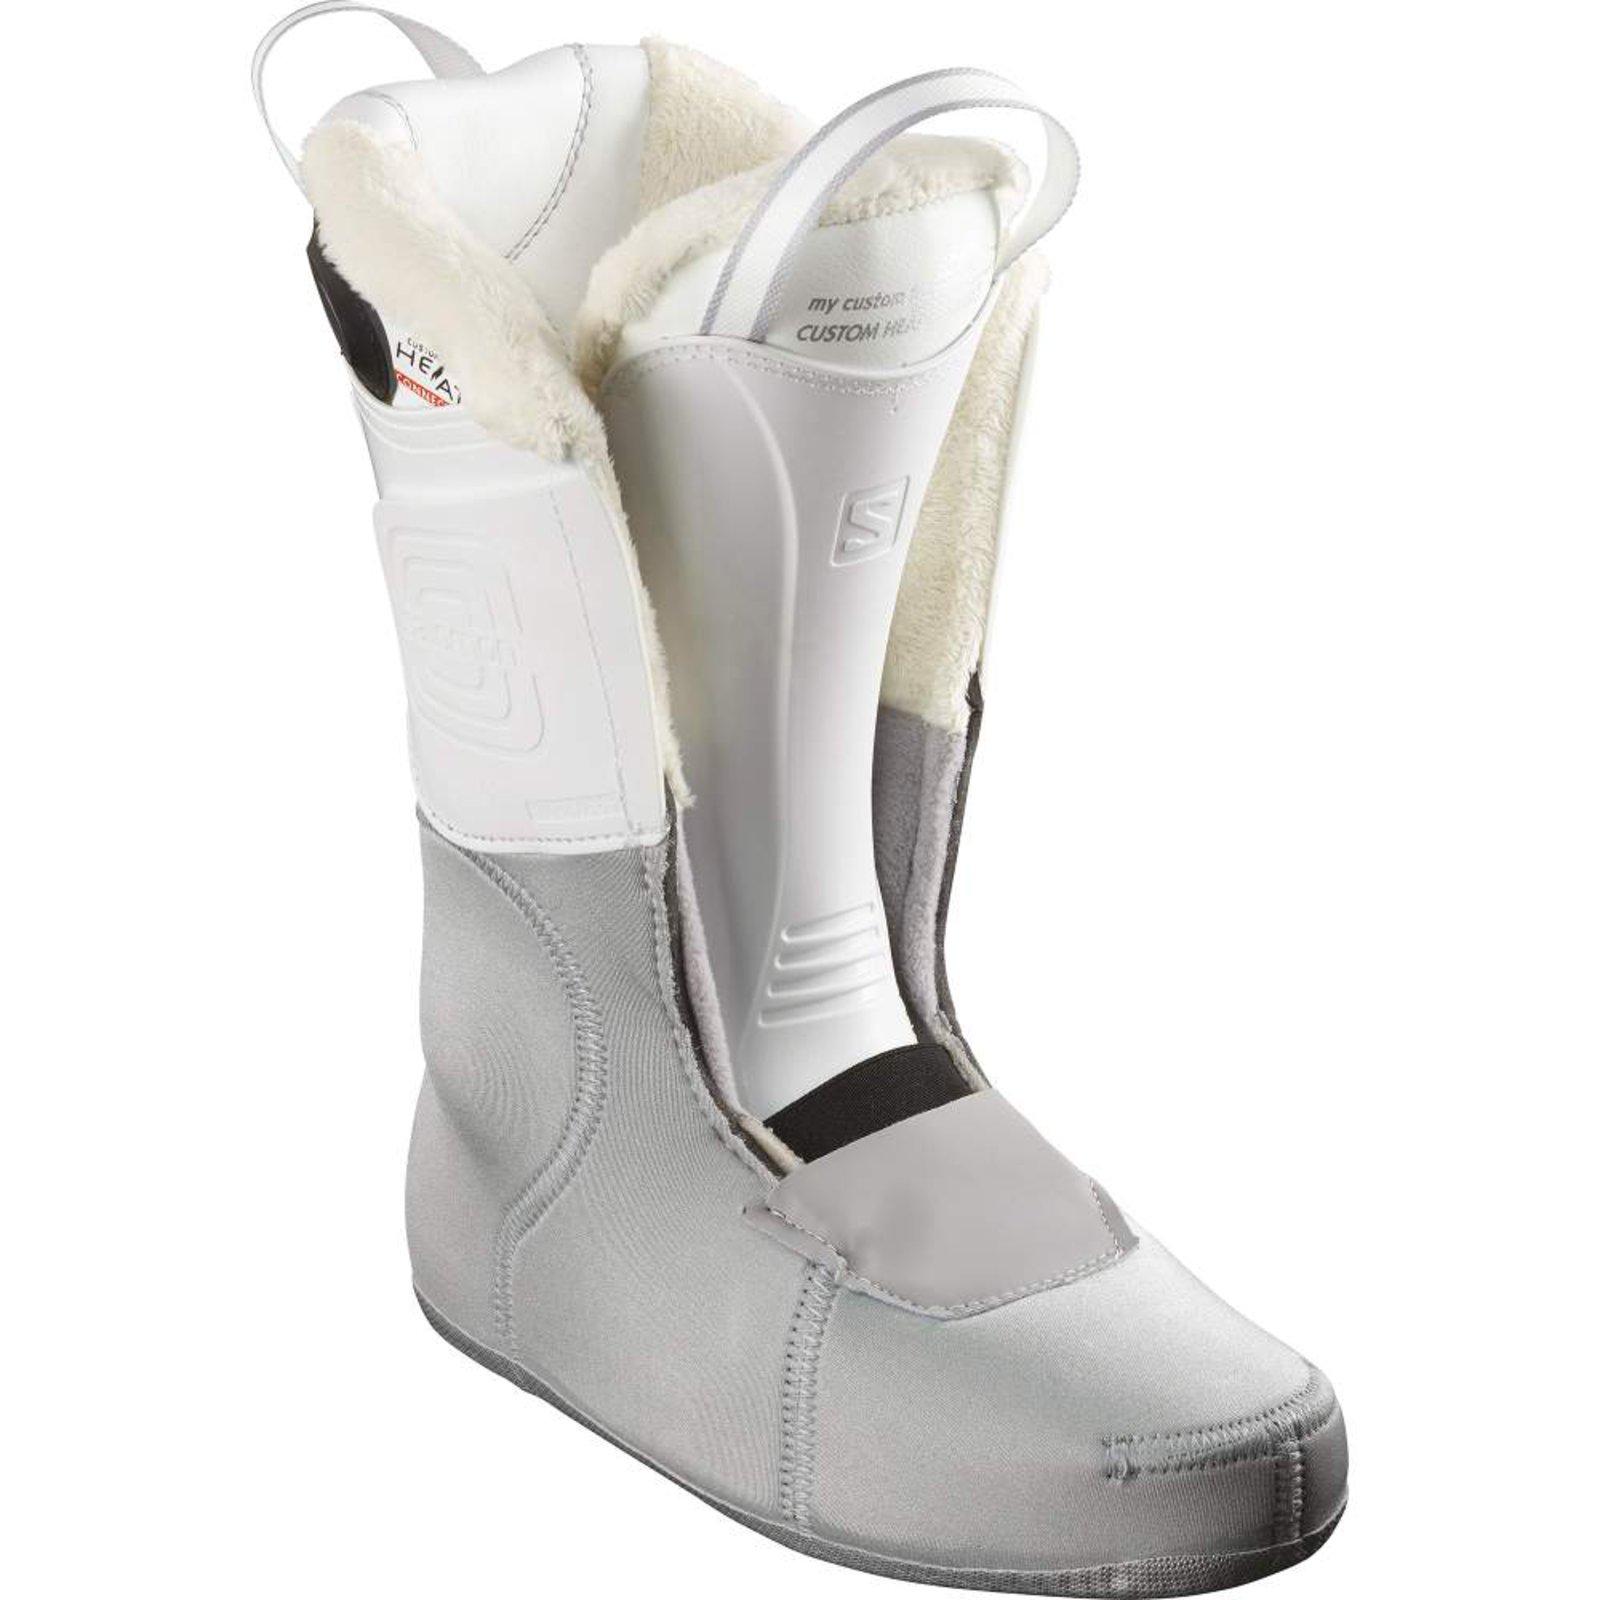 9048eea562f Lyžařské boty SALOMON X PRO 80 W CUSTOM HEAT CONNECT